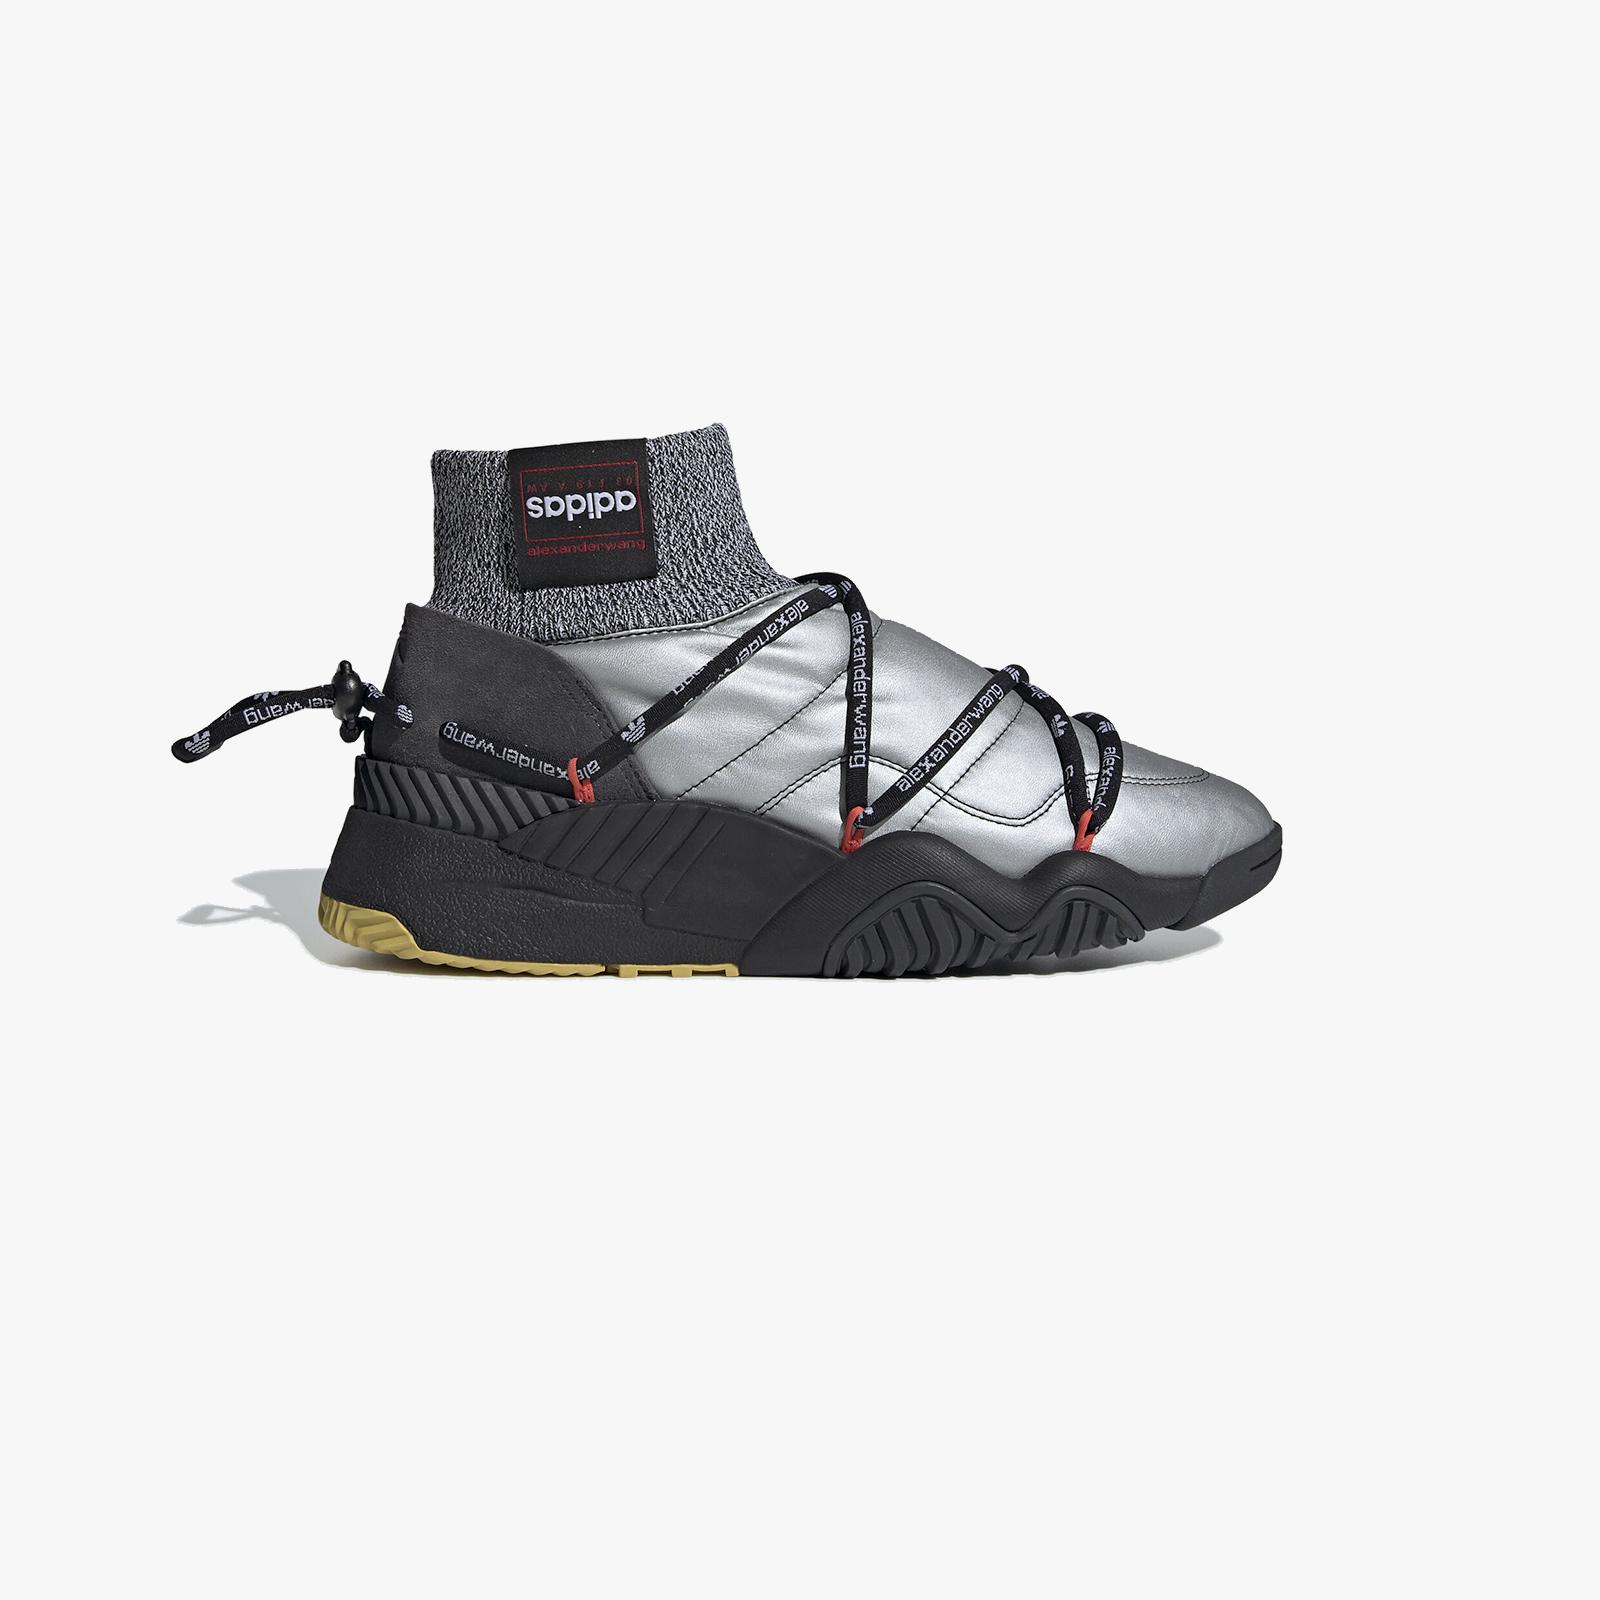 adidas AW Puff Trainer - Fv2960